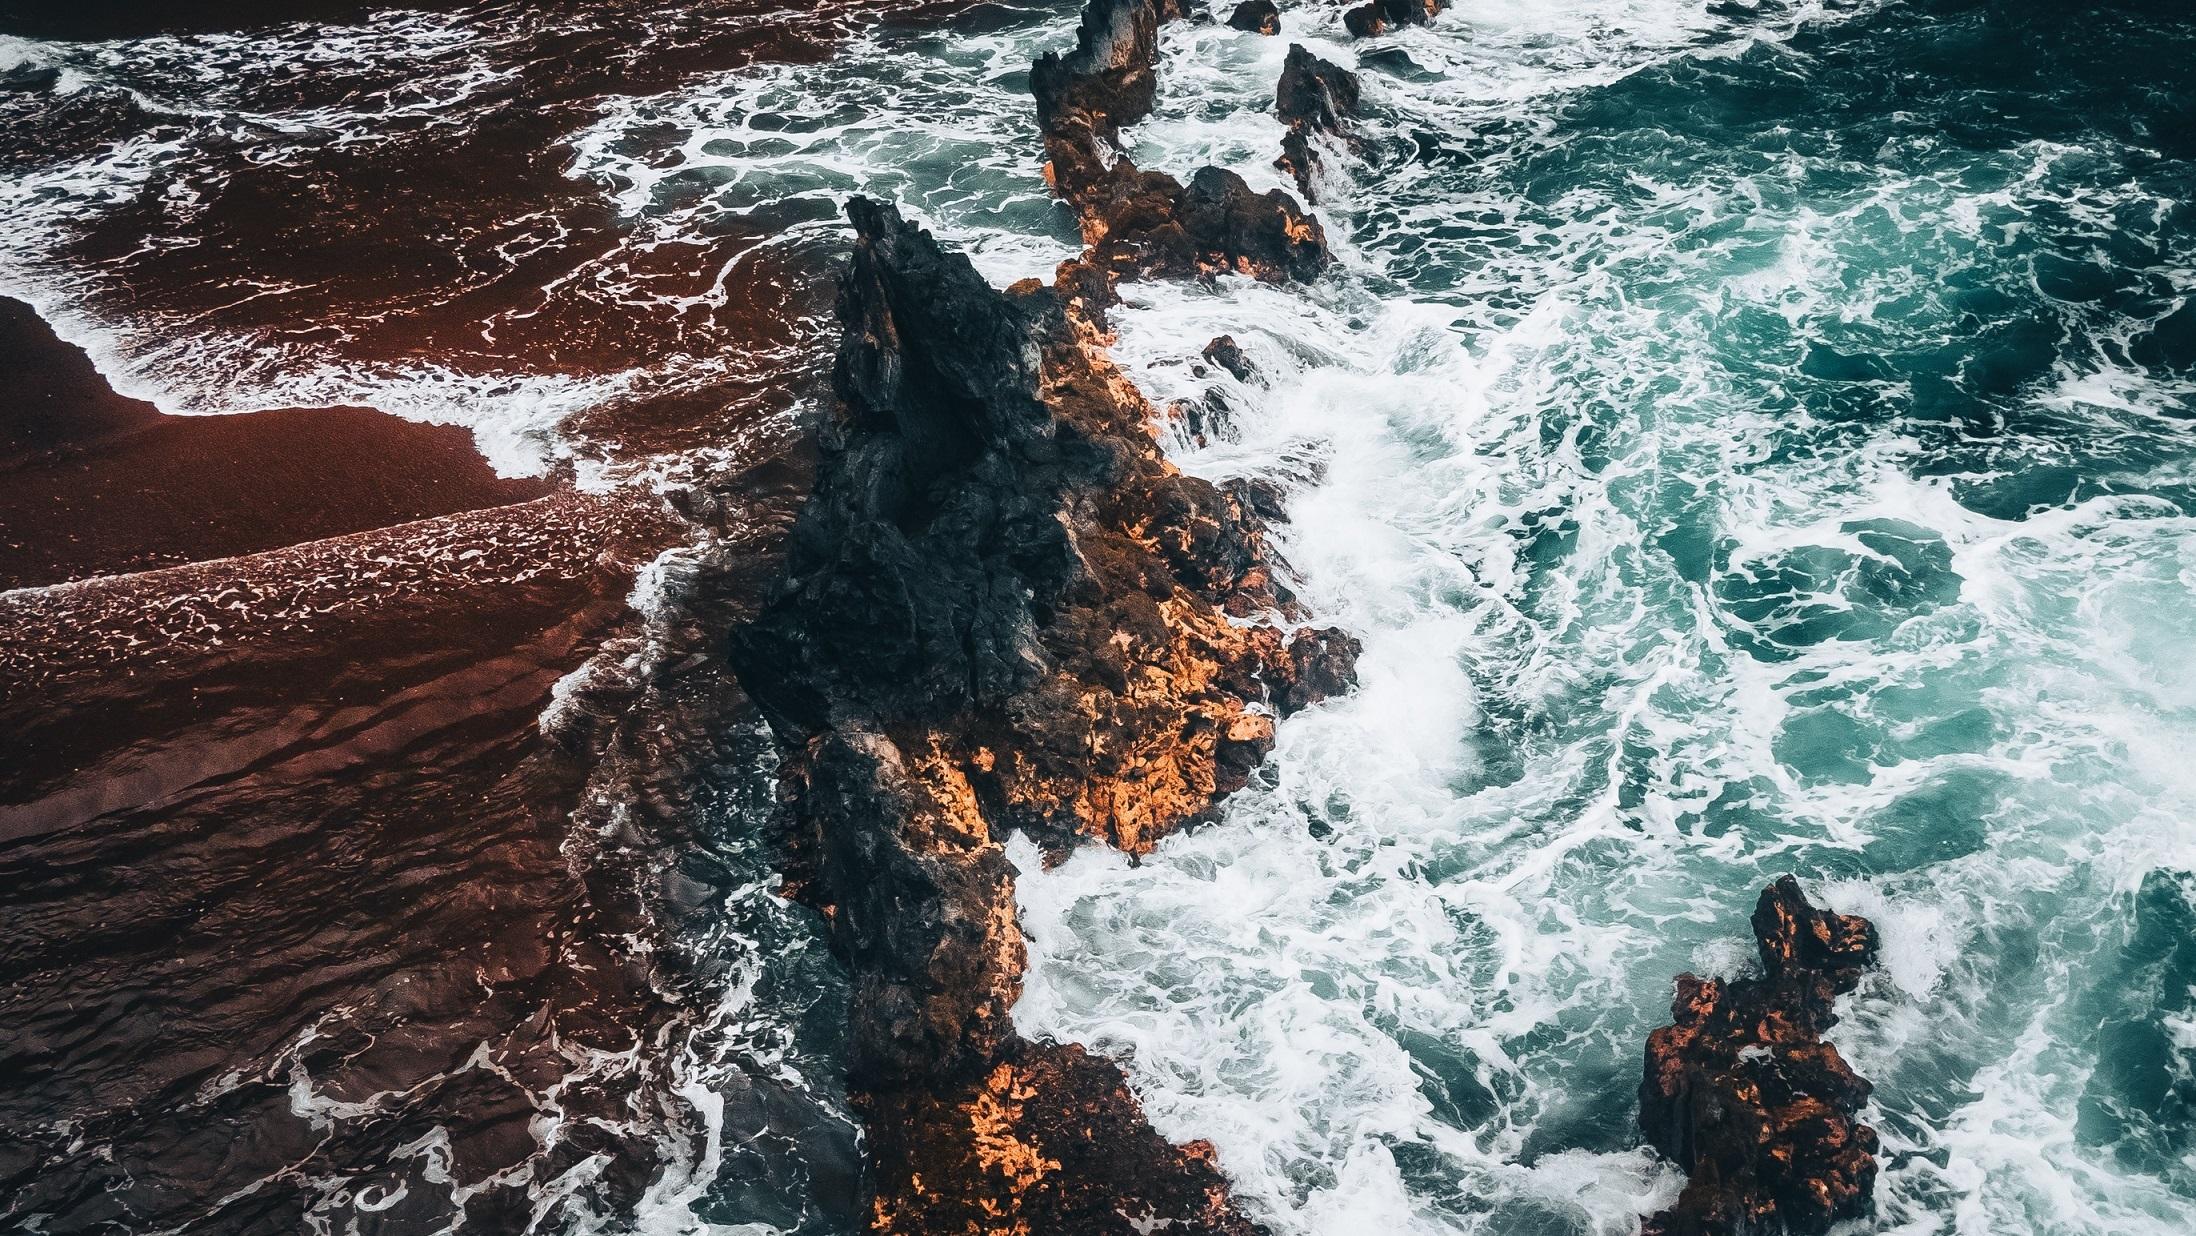 Overlooking Kaihalulu Beach in Maui, Hawaii